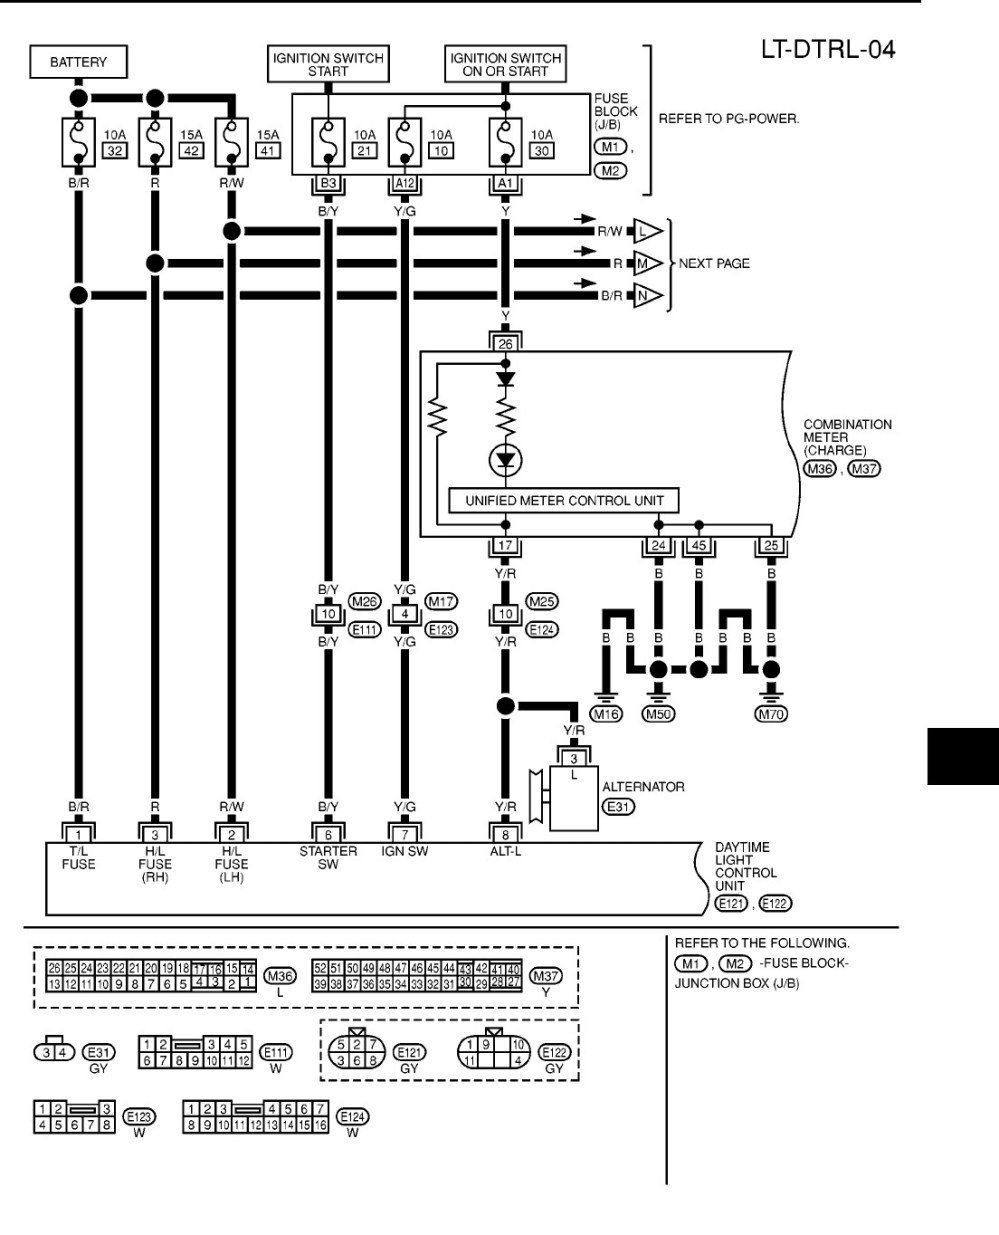 medium resolution of dodge m37 wiring diagram schema wiring diagram dodge m37 wiring diagram wiring library dodge m37 wiring